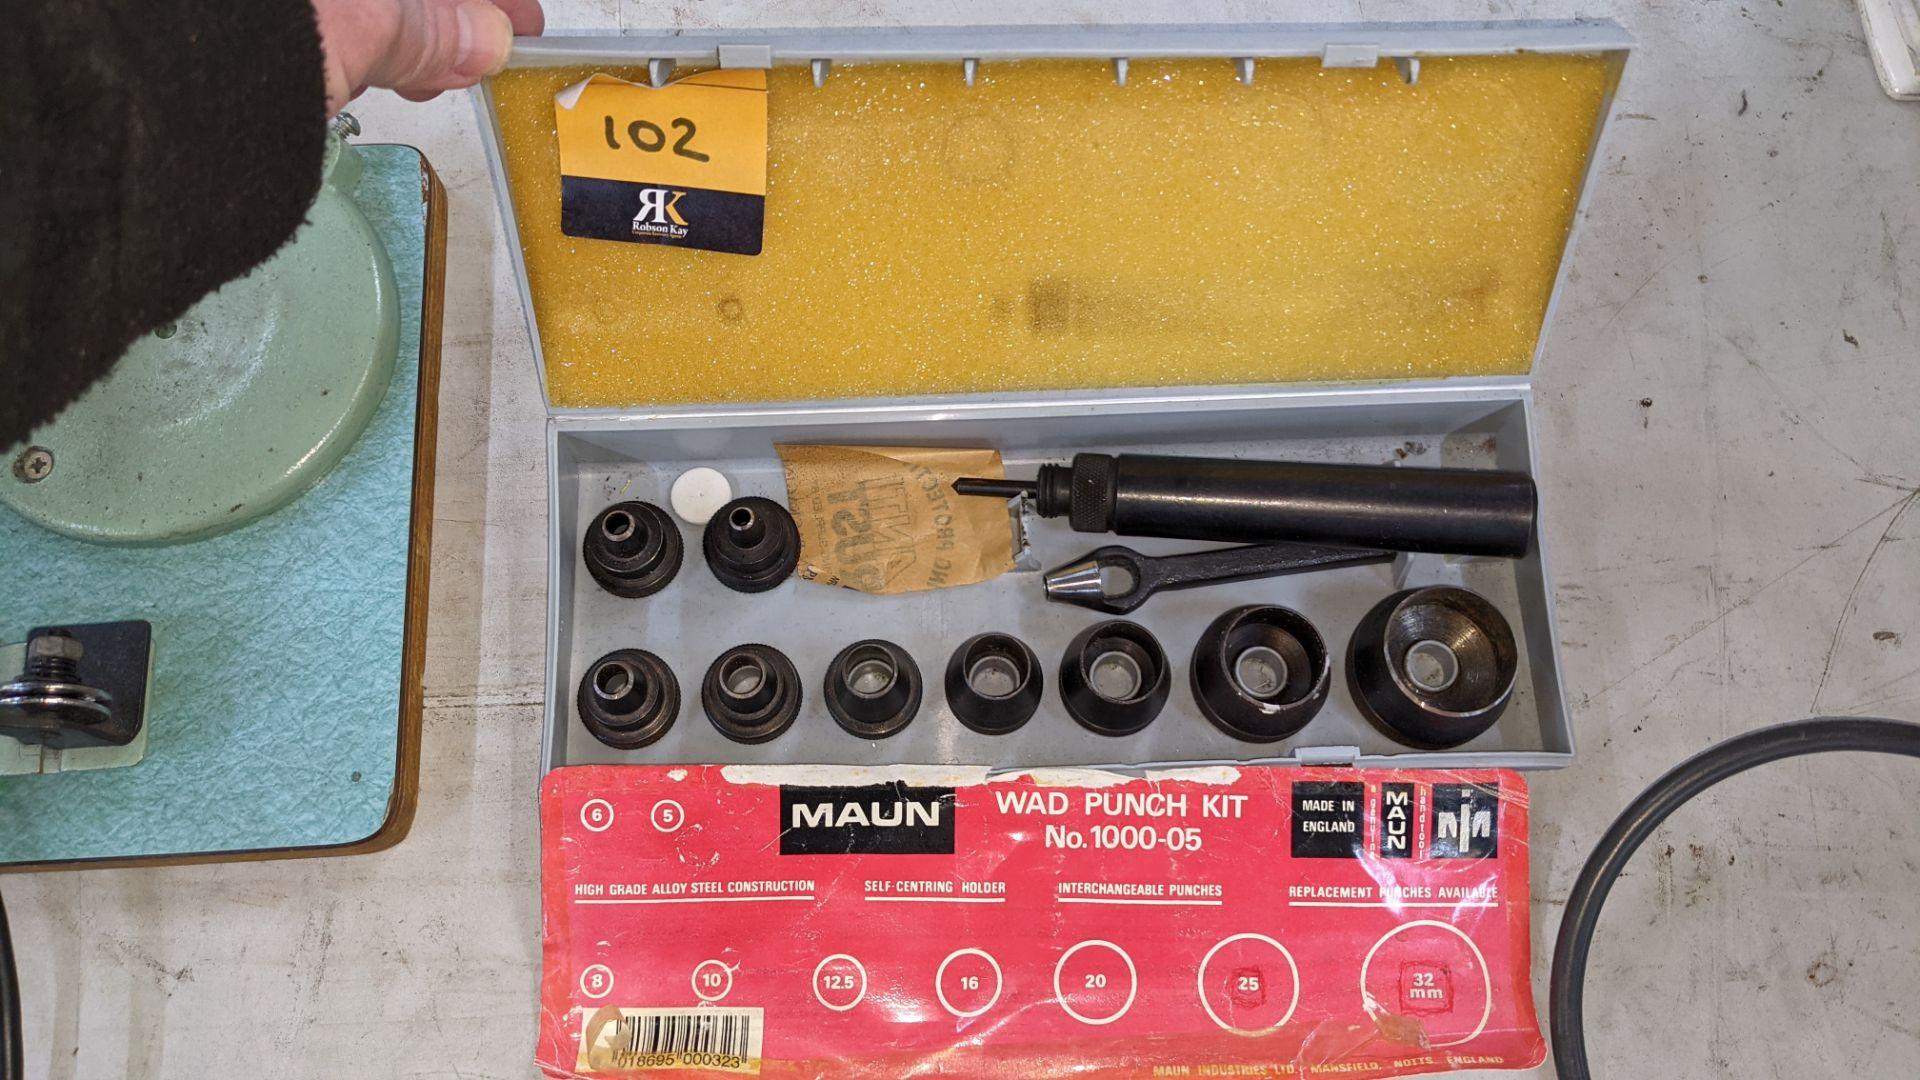 Maun wad punch kit number 1000-05 - Image 2 of 4